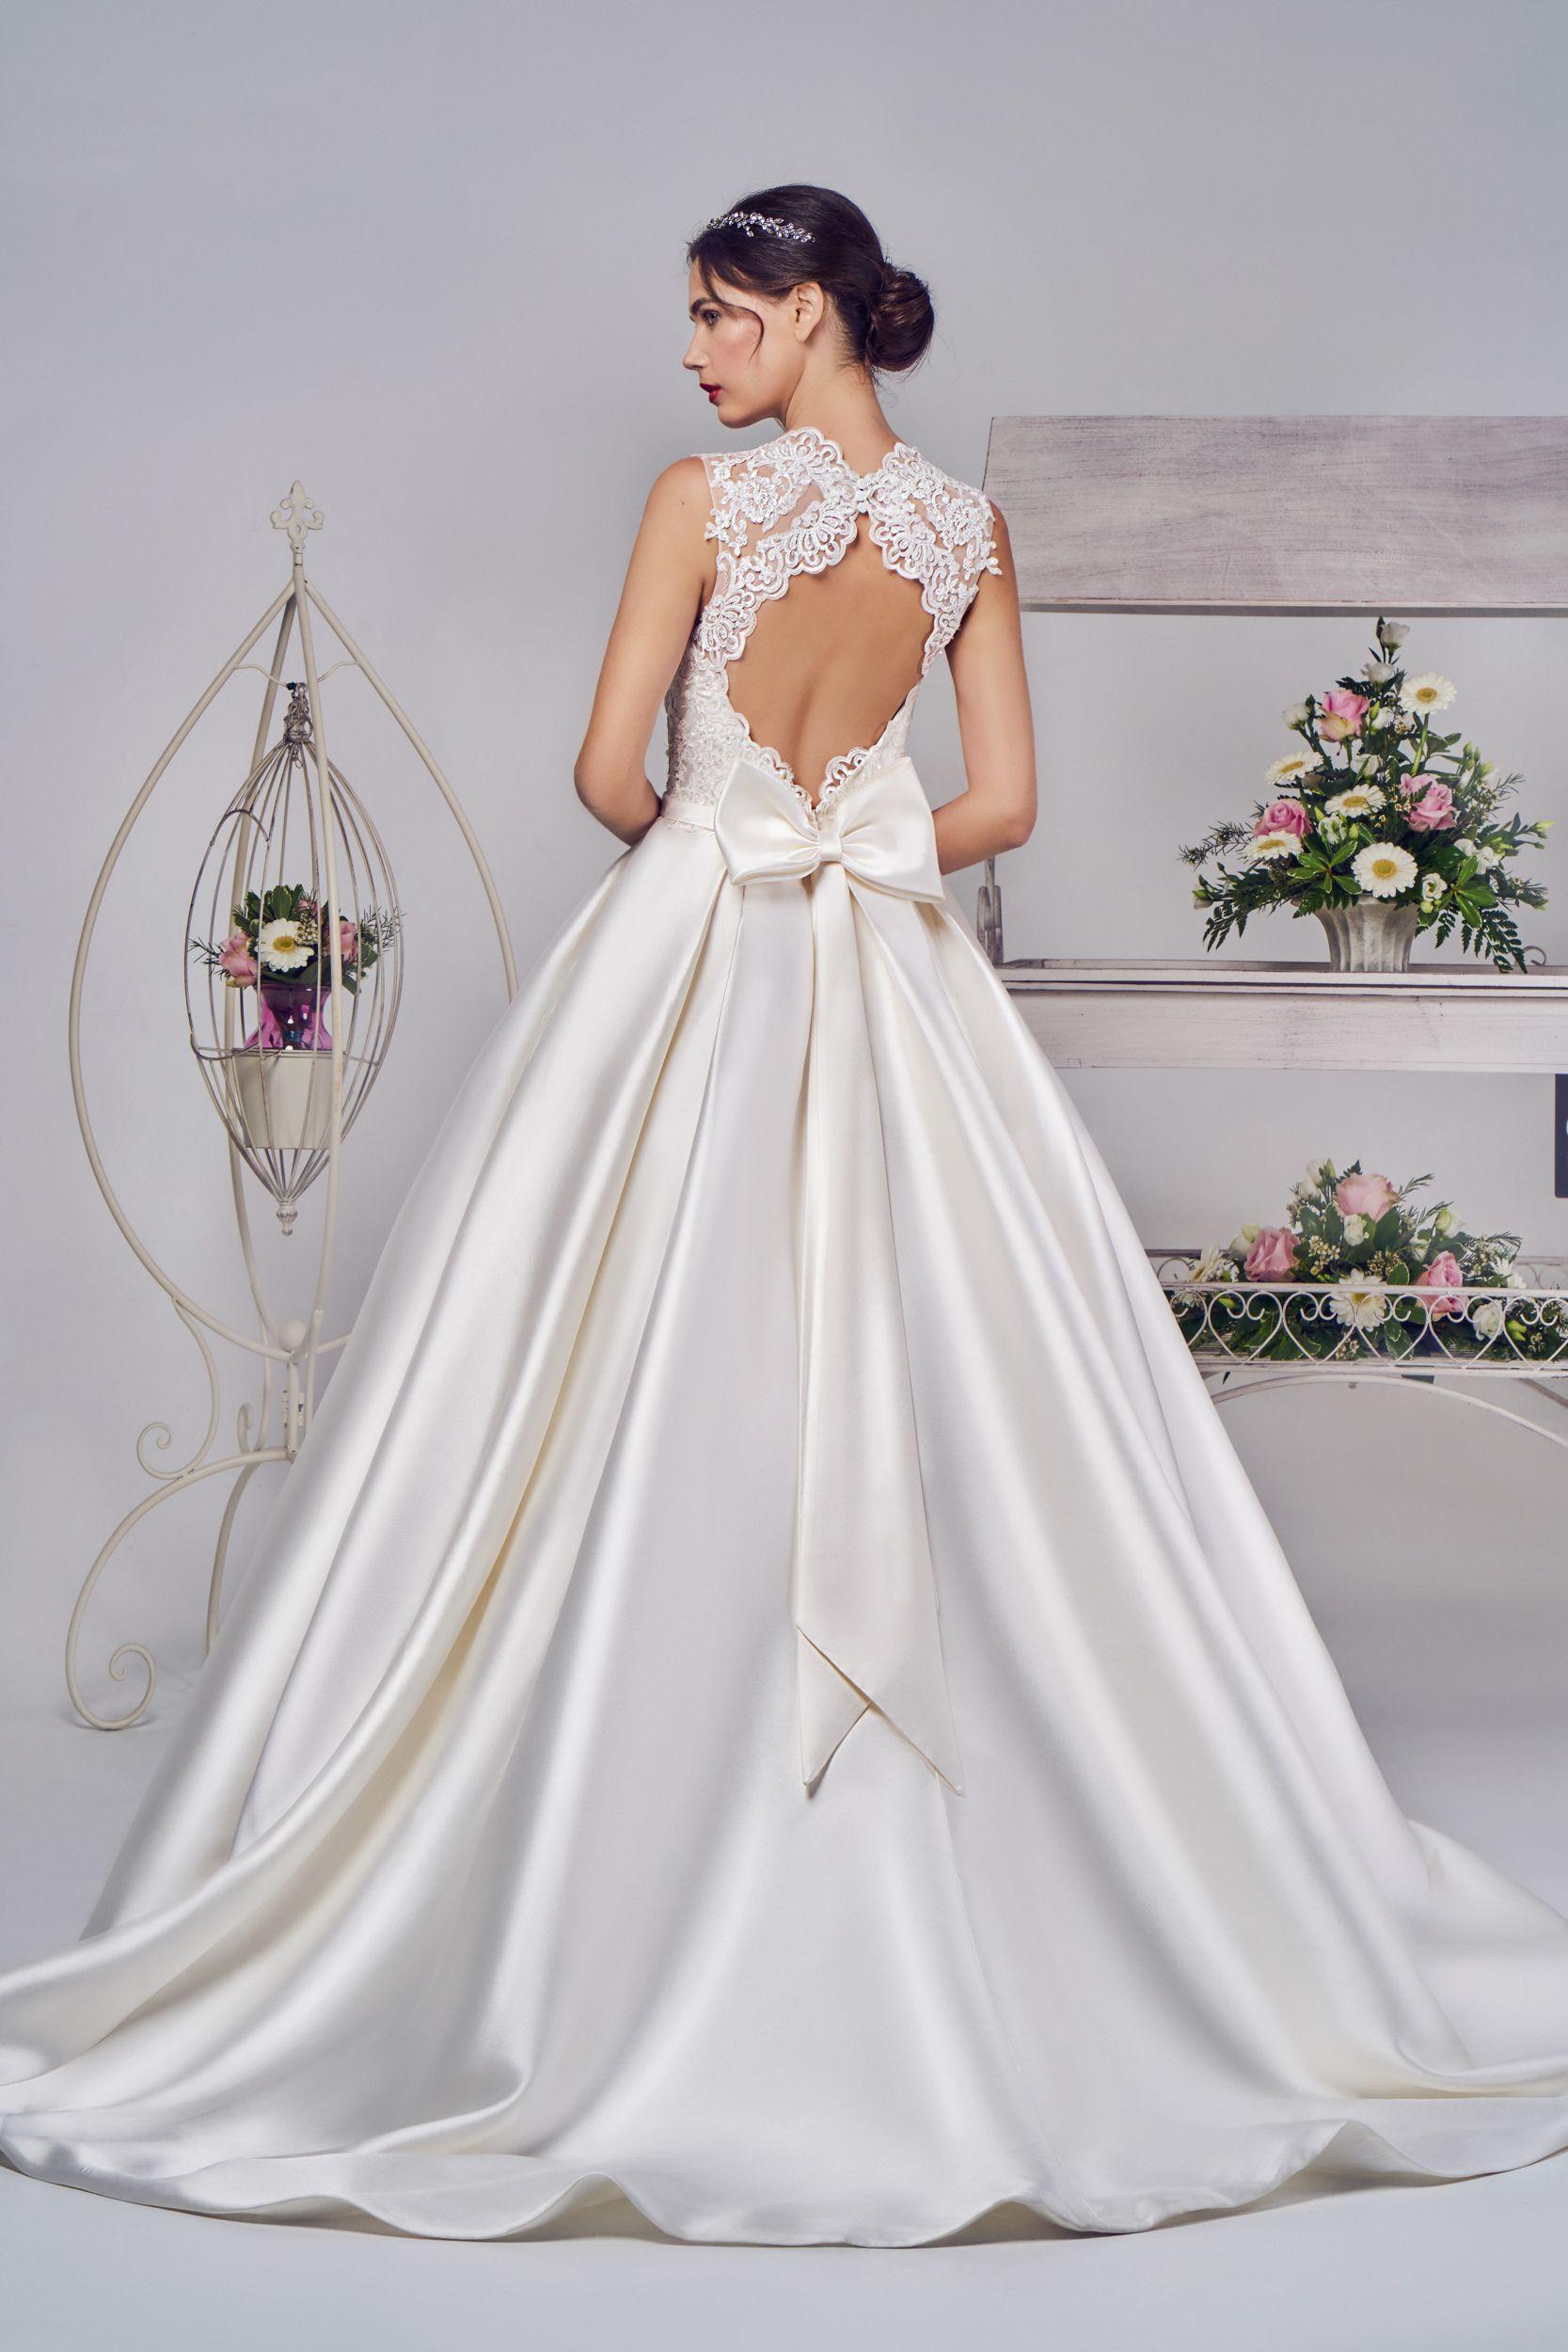 12 pippa middleton inspired wedding dress styles wedding for Pippa middleton wedding dress buy